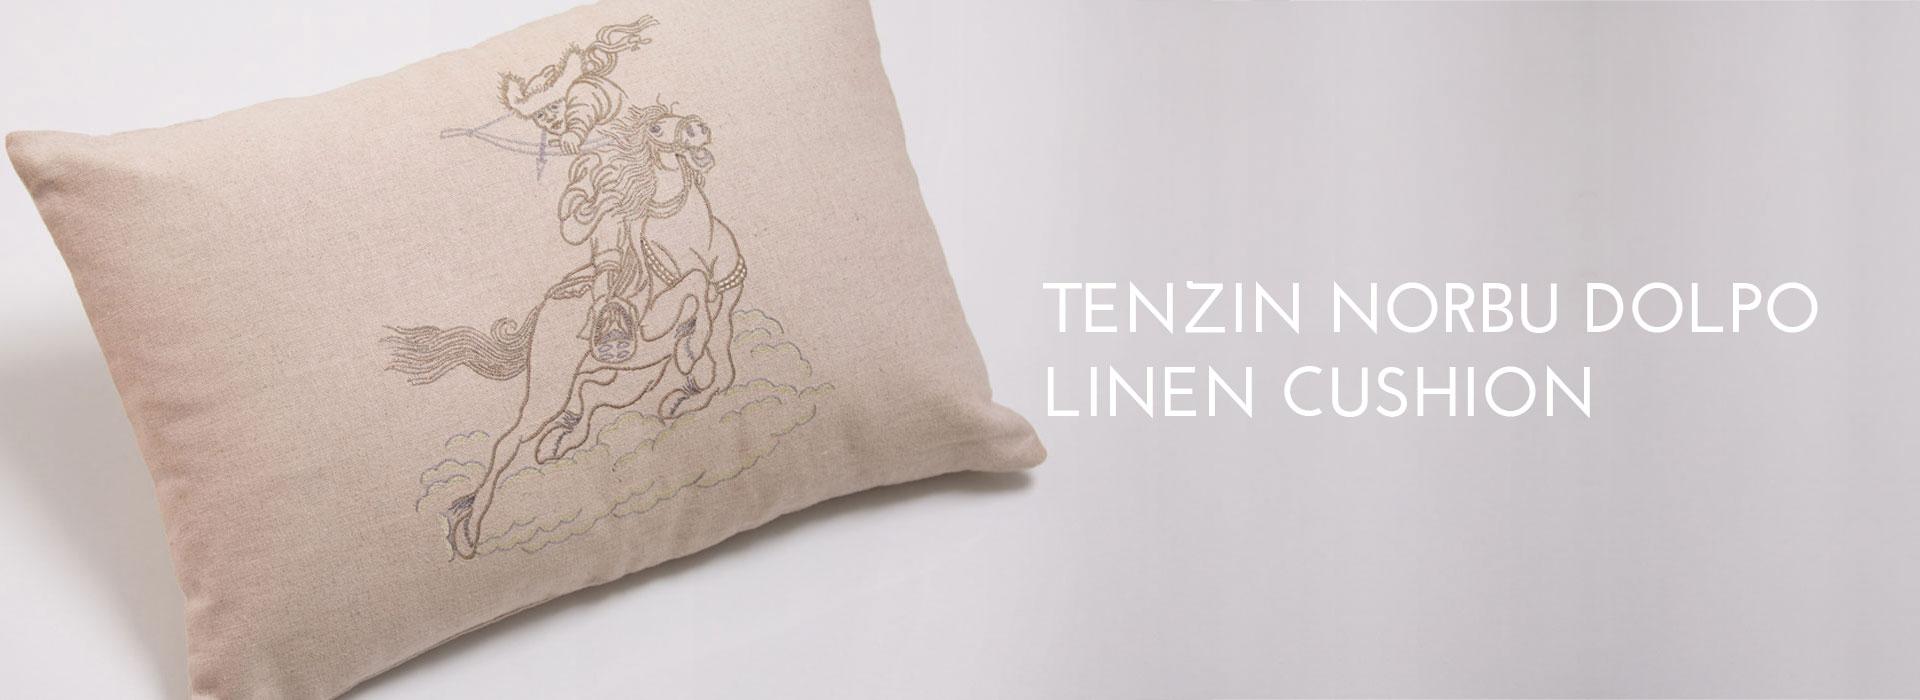 Tenzin Norbu Dolpo Linen Cushion